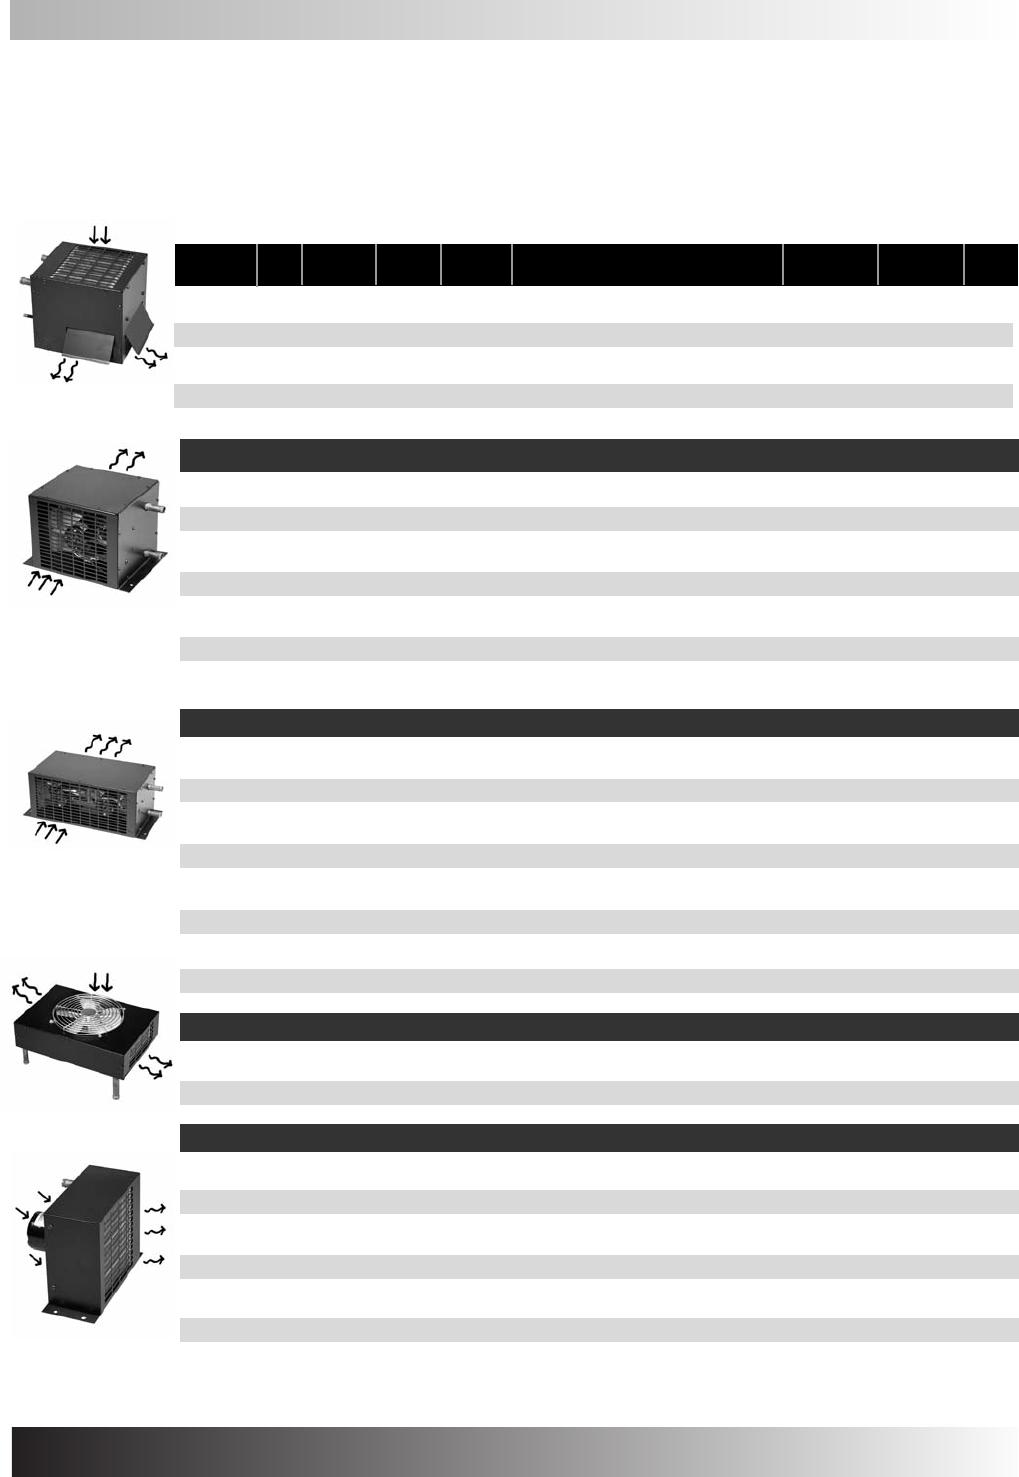 2 10 Zerostart Guts Navistar Ht 570 Engine Diagram Phillips Temro Industries 952 941 9700 Us Or 800 328 6108 Phillipsandtemrocom